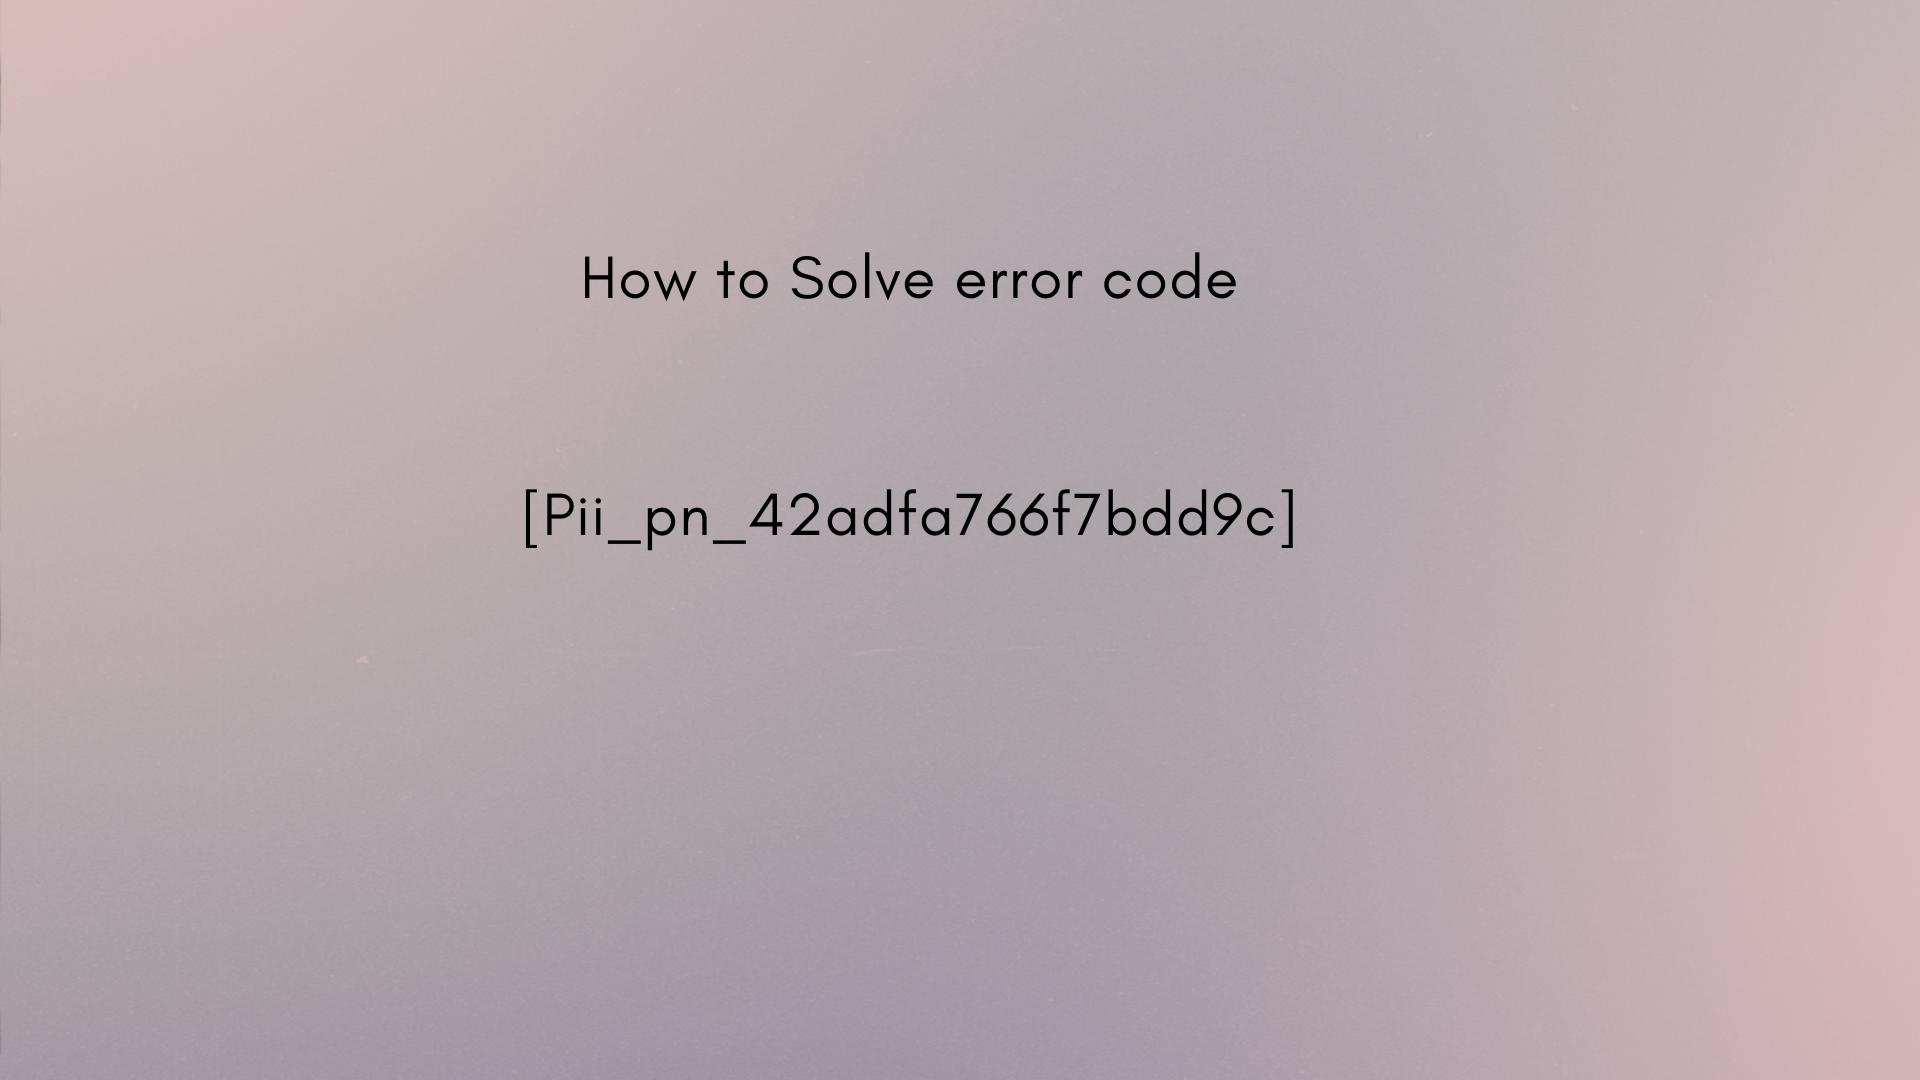 How To Solved [pii_email_5df70dfa05d9b2c10f6d] Error Code in 2021?